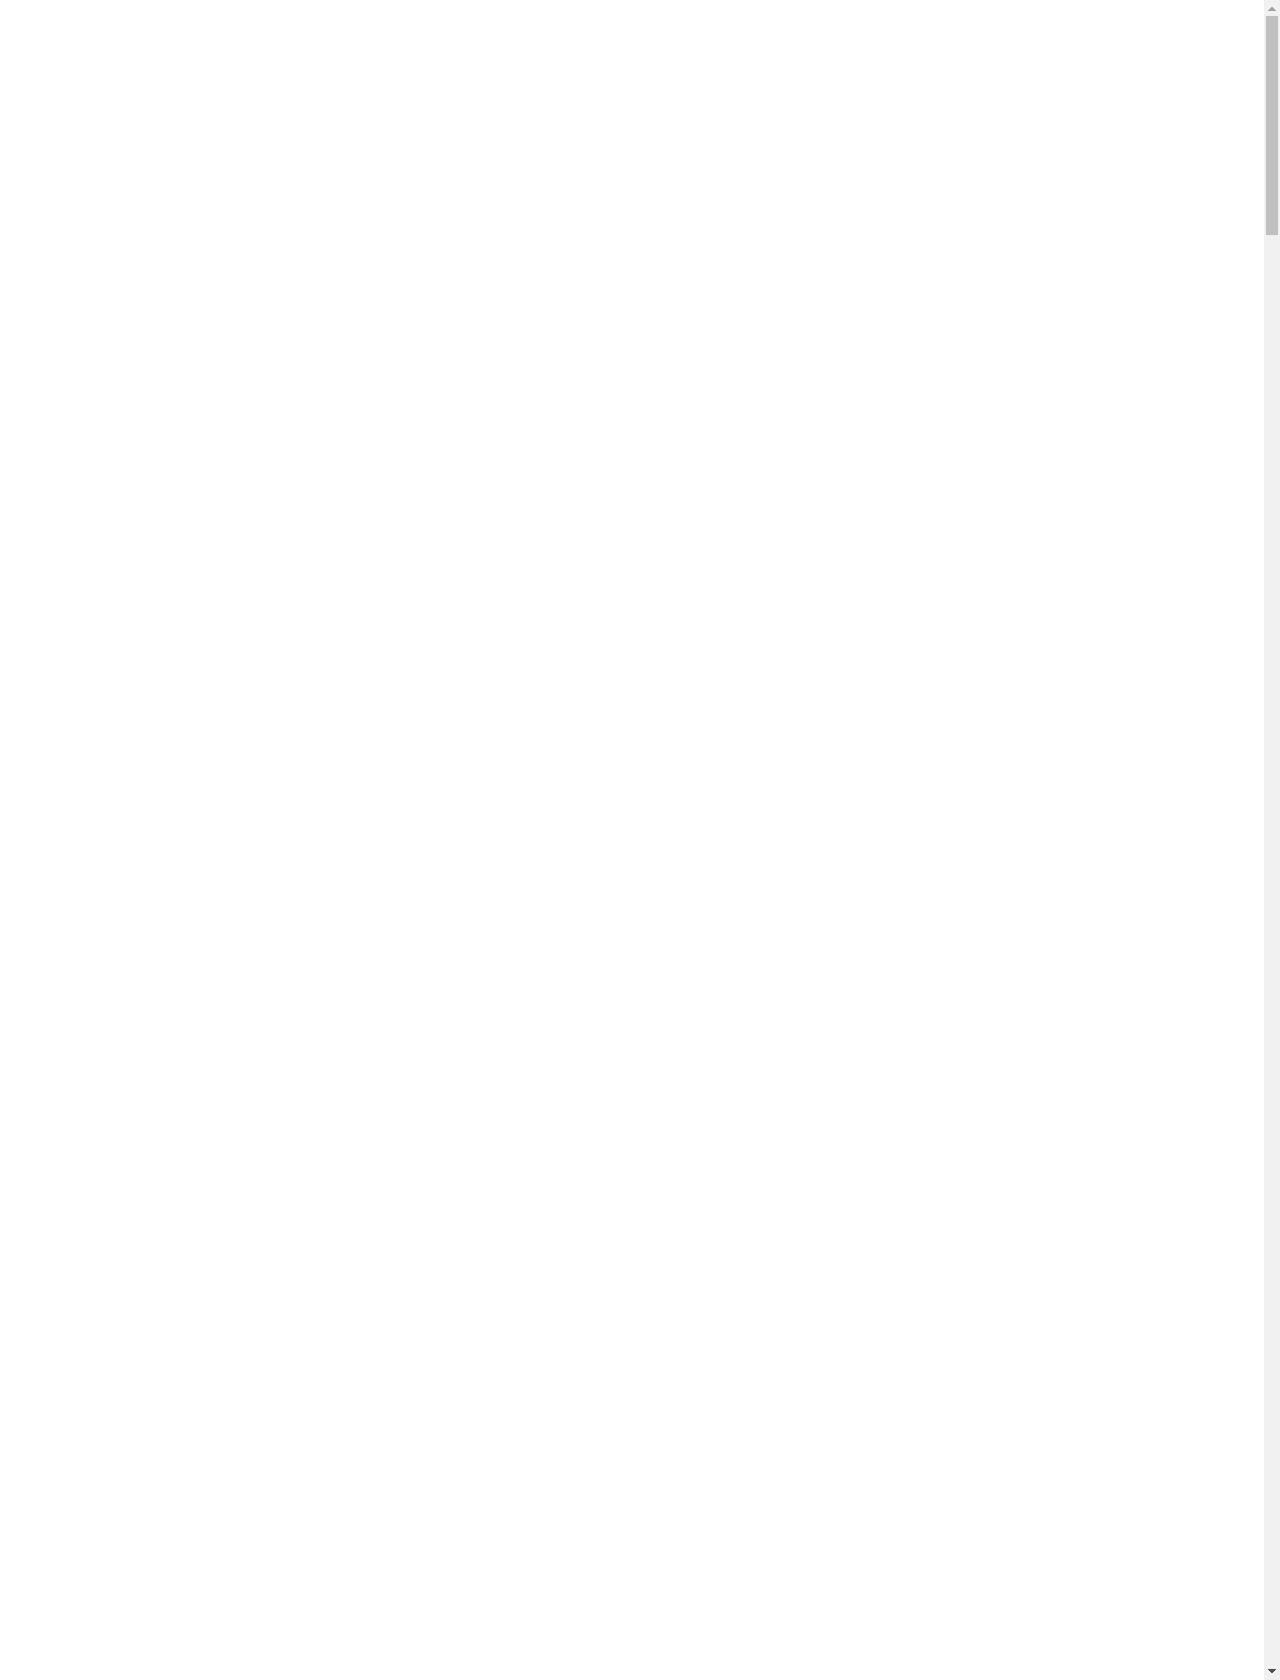 Screenshot Desktop - https://www.digitale-wegeverwaltung.de/